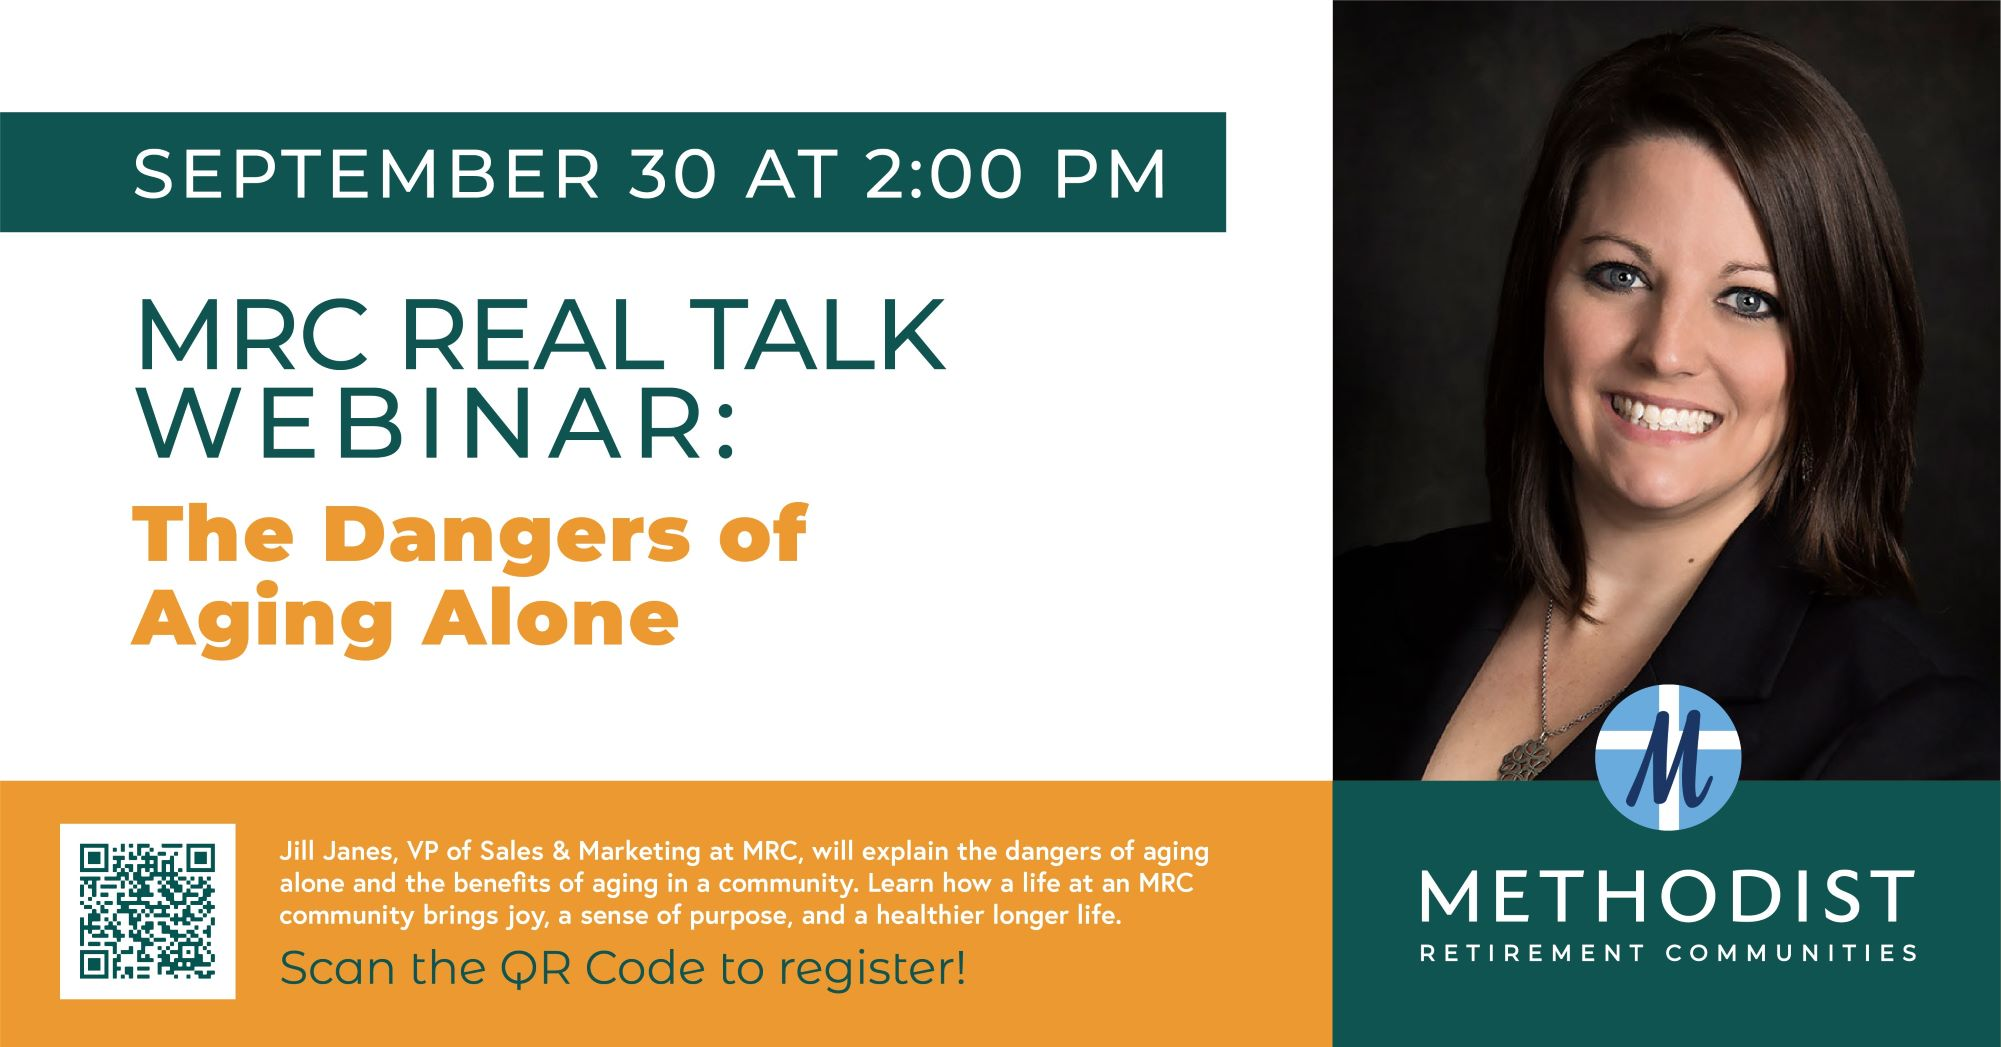 MRC REAL TALK WEBINAR: The Dangers of Living Alone!